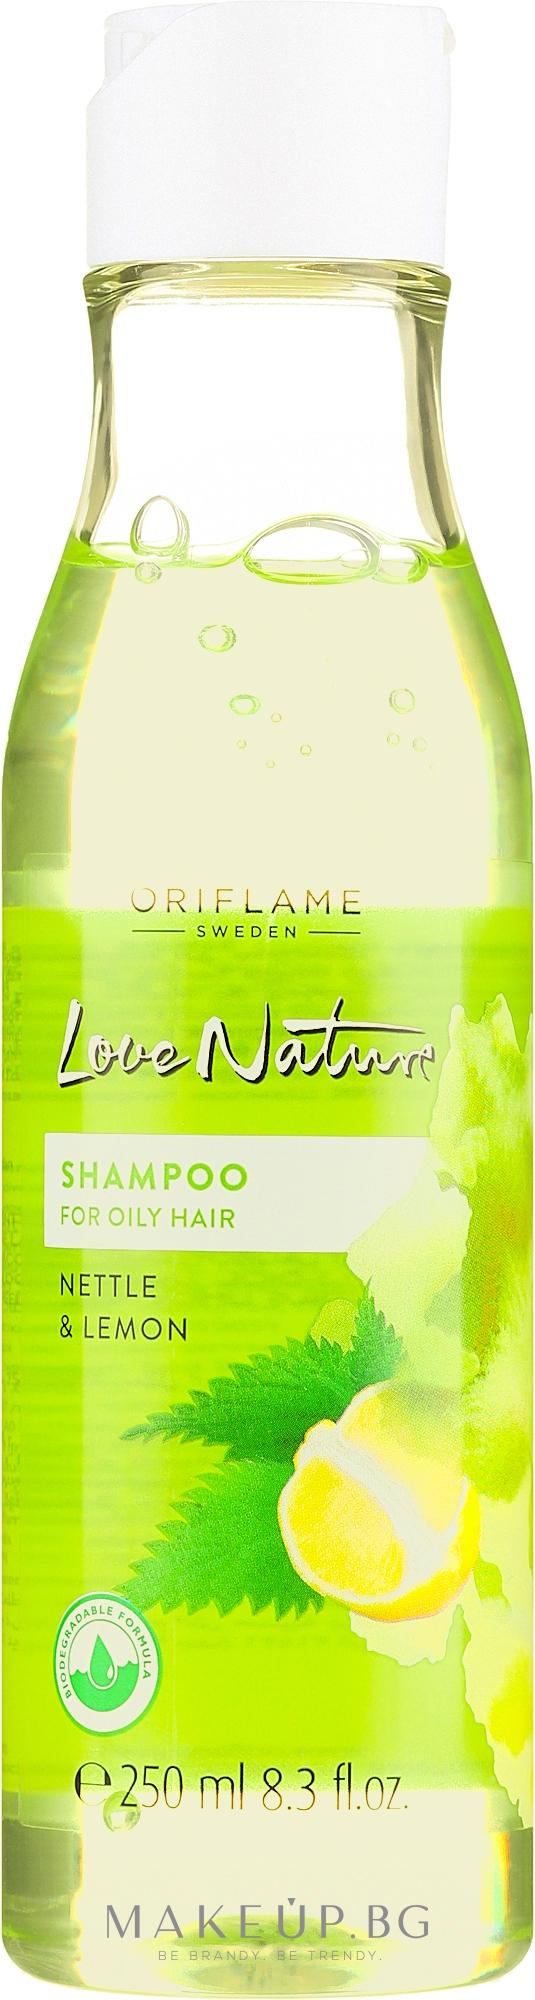 "Шампоан за мазна коса ""Коприва и лимон"" - Oriflame Love Nature Shampoo — снимка 250 ml"